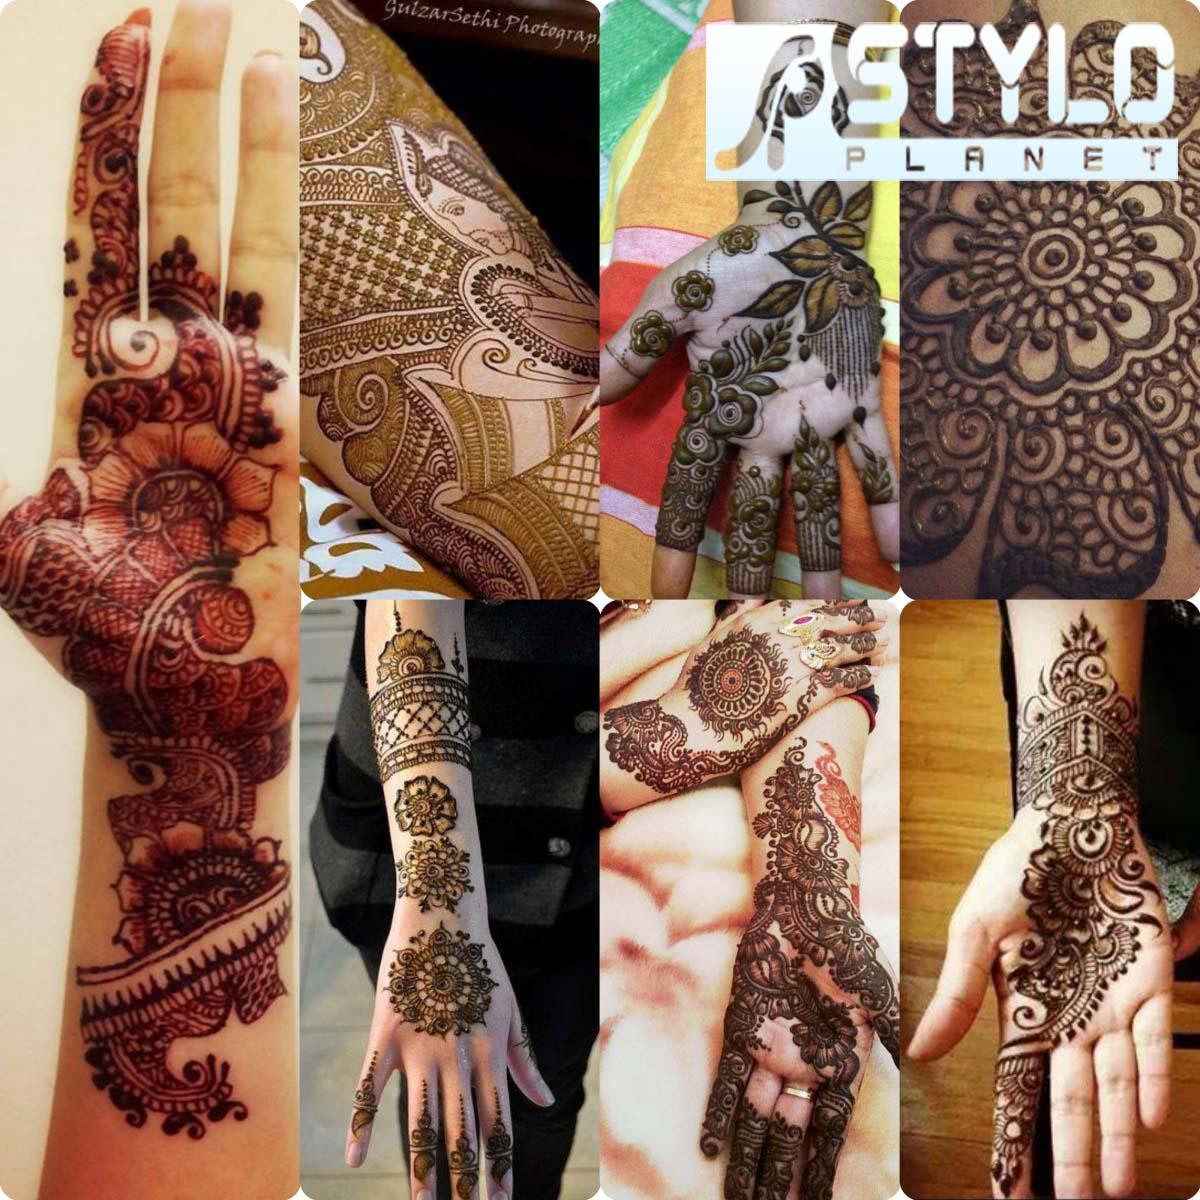 EidulAdha Mehndi Design For Women 20162017  Stylo Planet